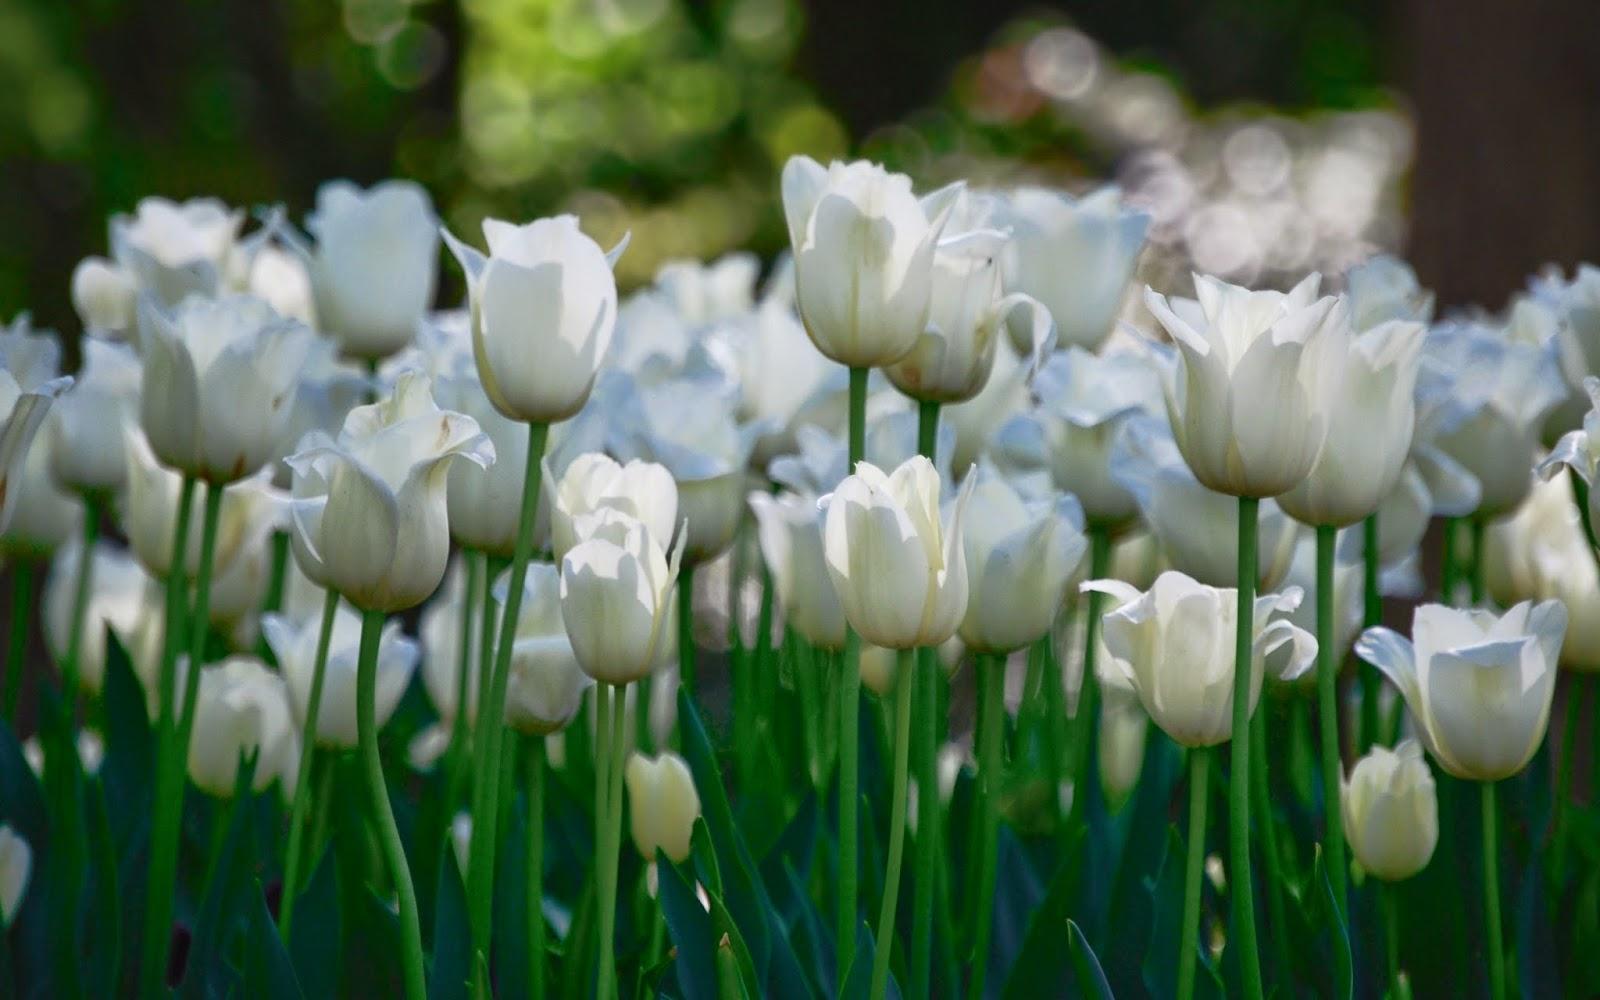 Imagenes de Amor, Flores Blancas, parte 2